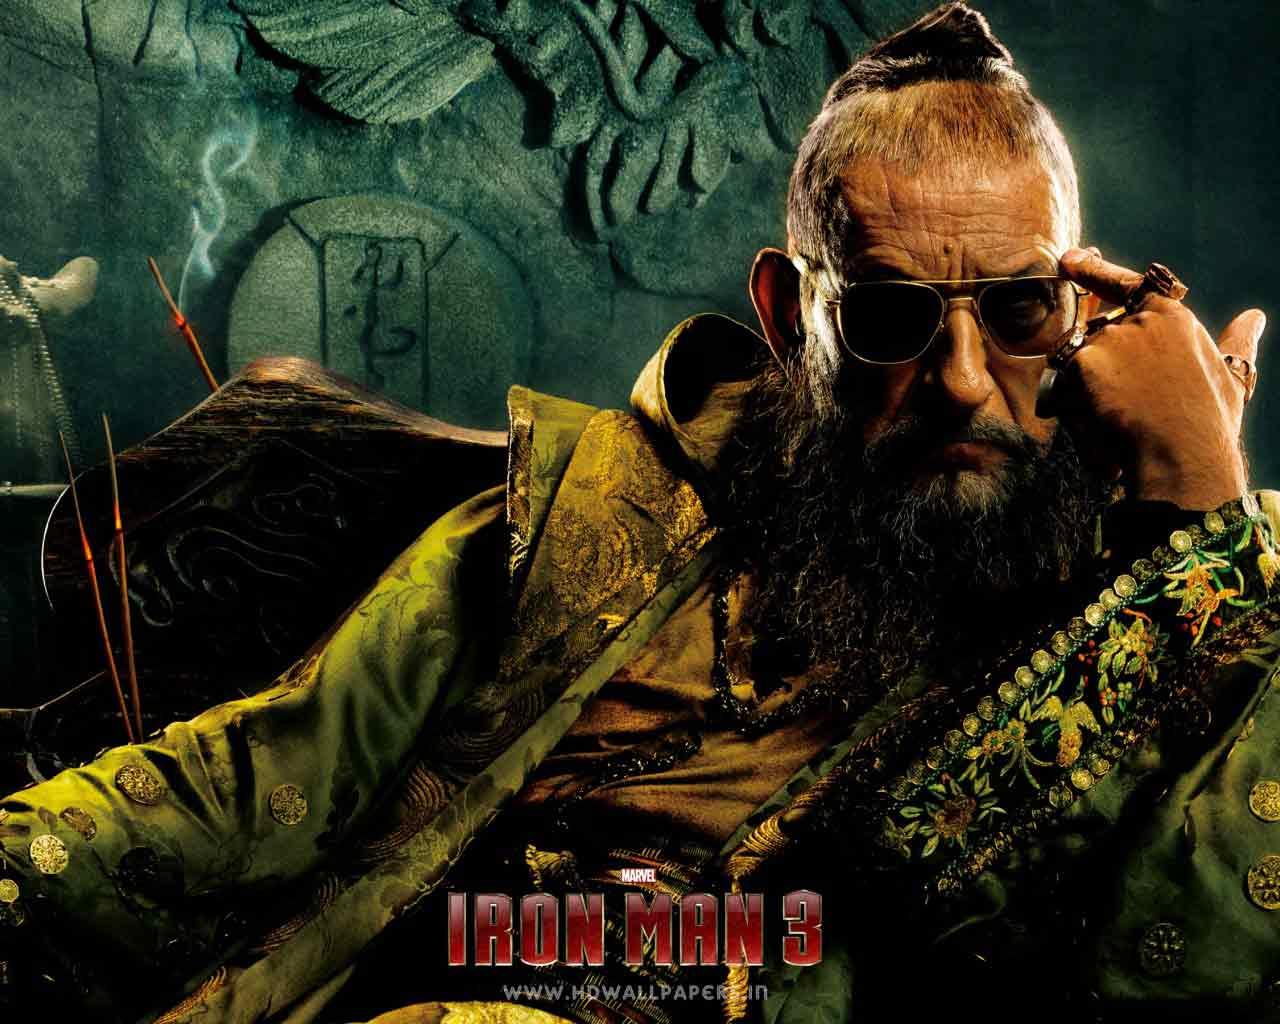 David Wilcock ~ DISCLOSURE SHOWDOWN: The War For The Truth Iron_man_3___the_mandarin-1280x1024